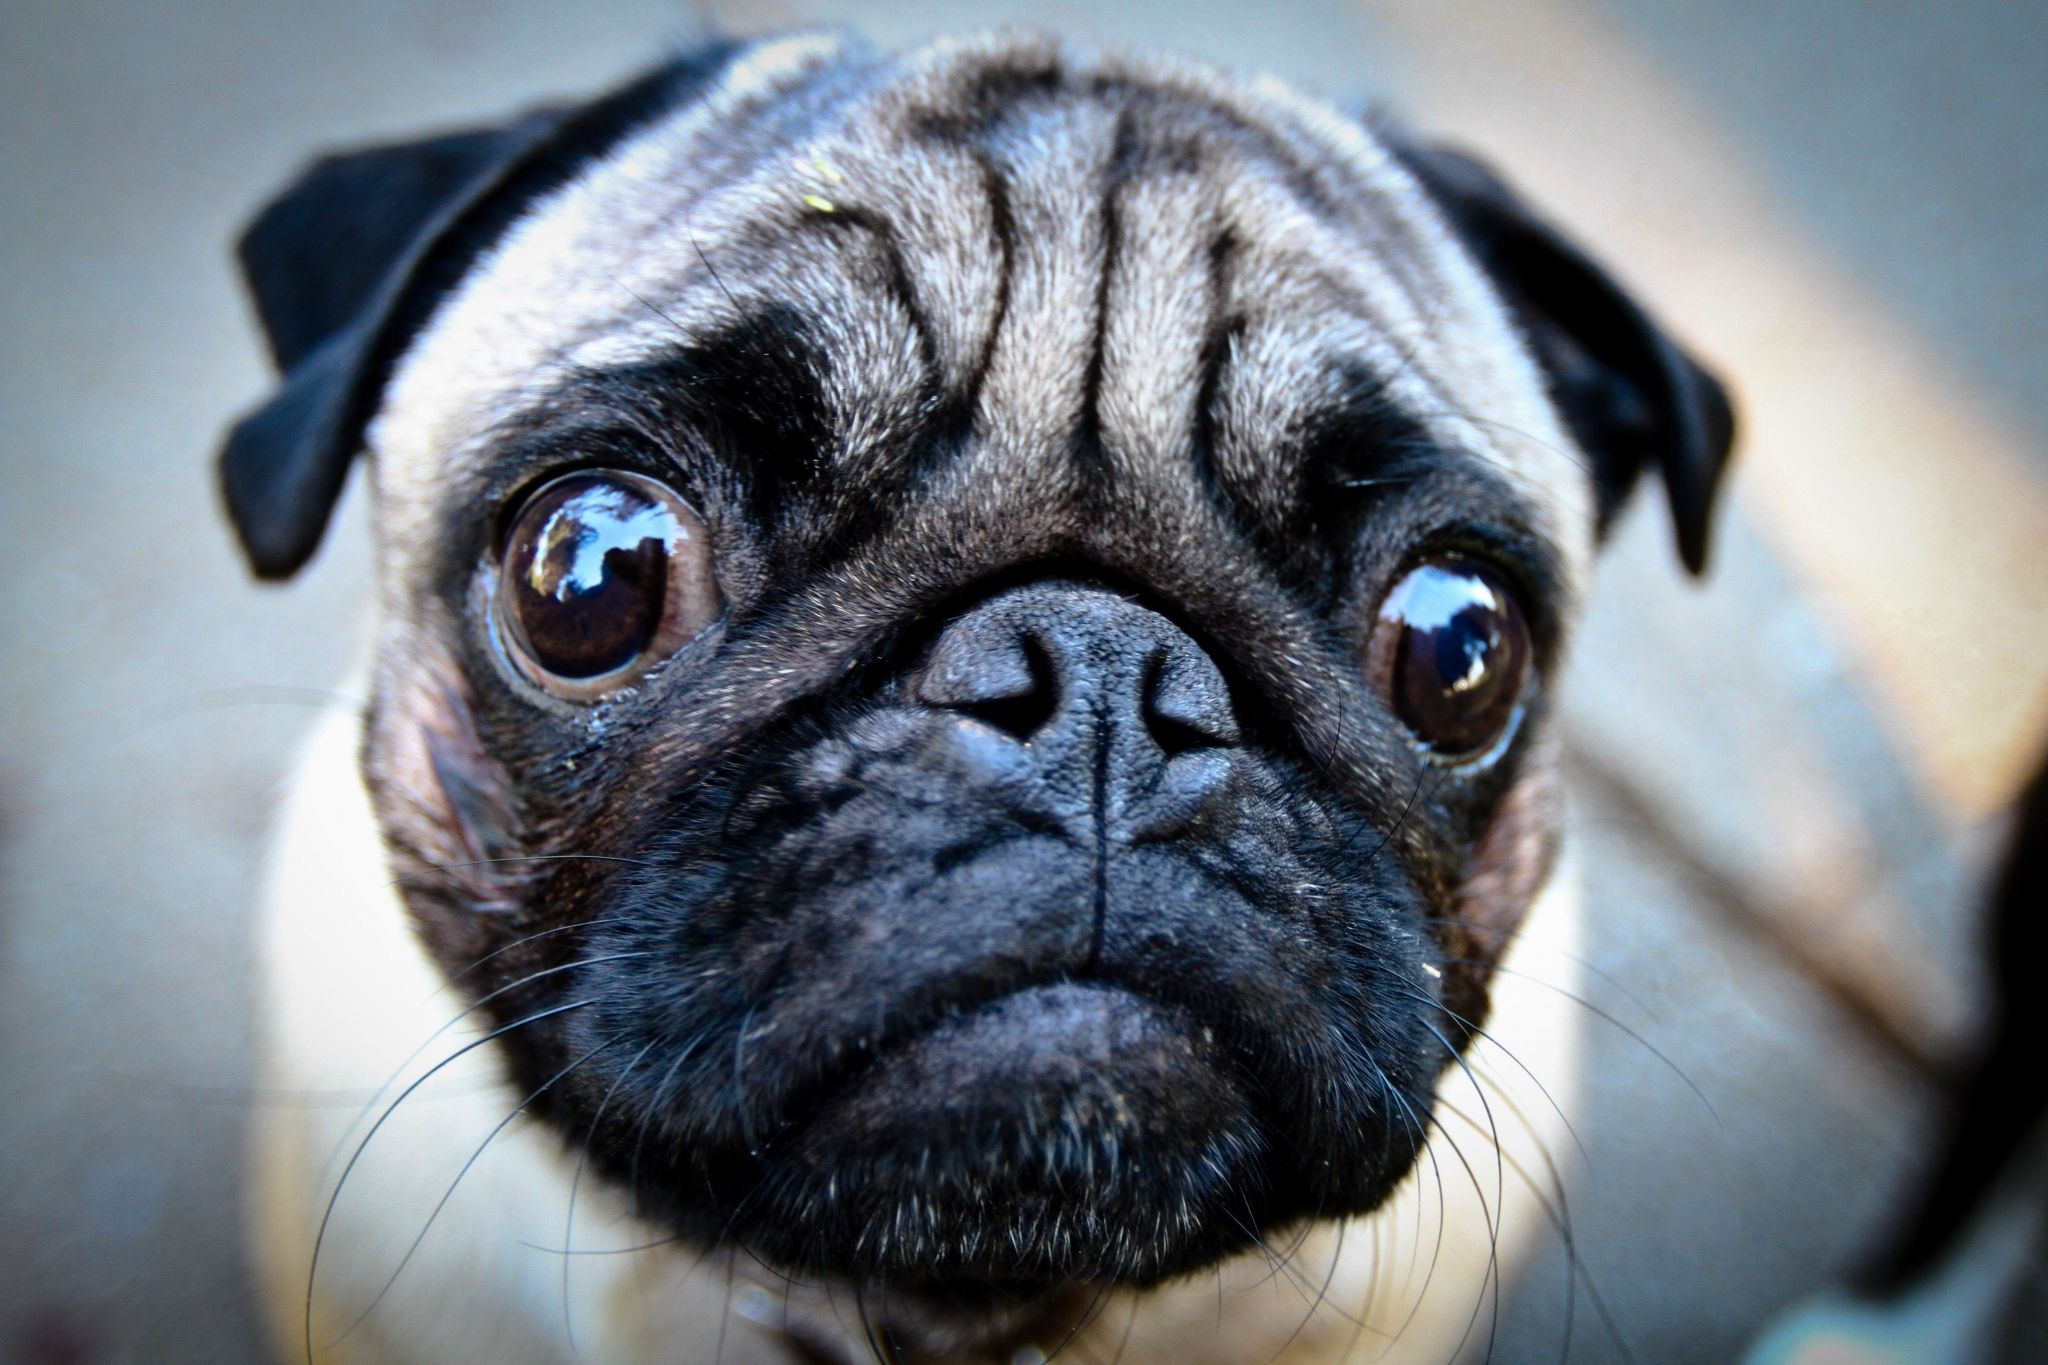 Pug Hd Wallpapers 1080p High Quality Pugs Funny Cute Pugs Funny Pug Videos